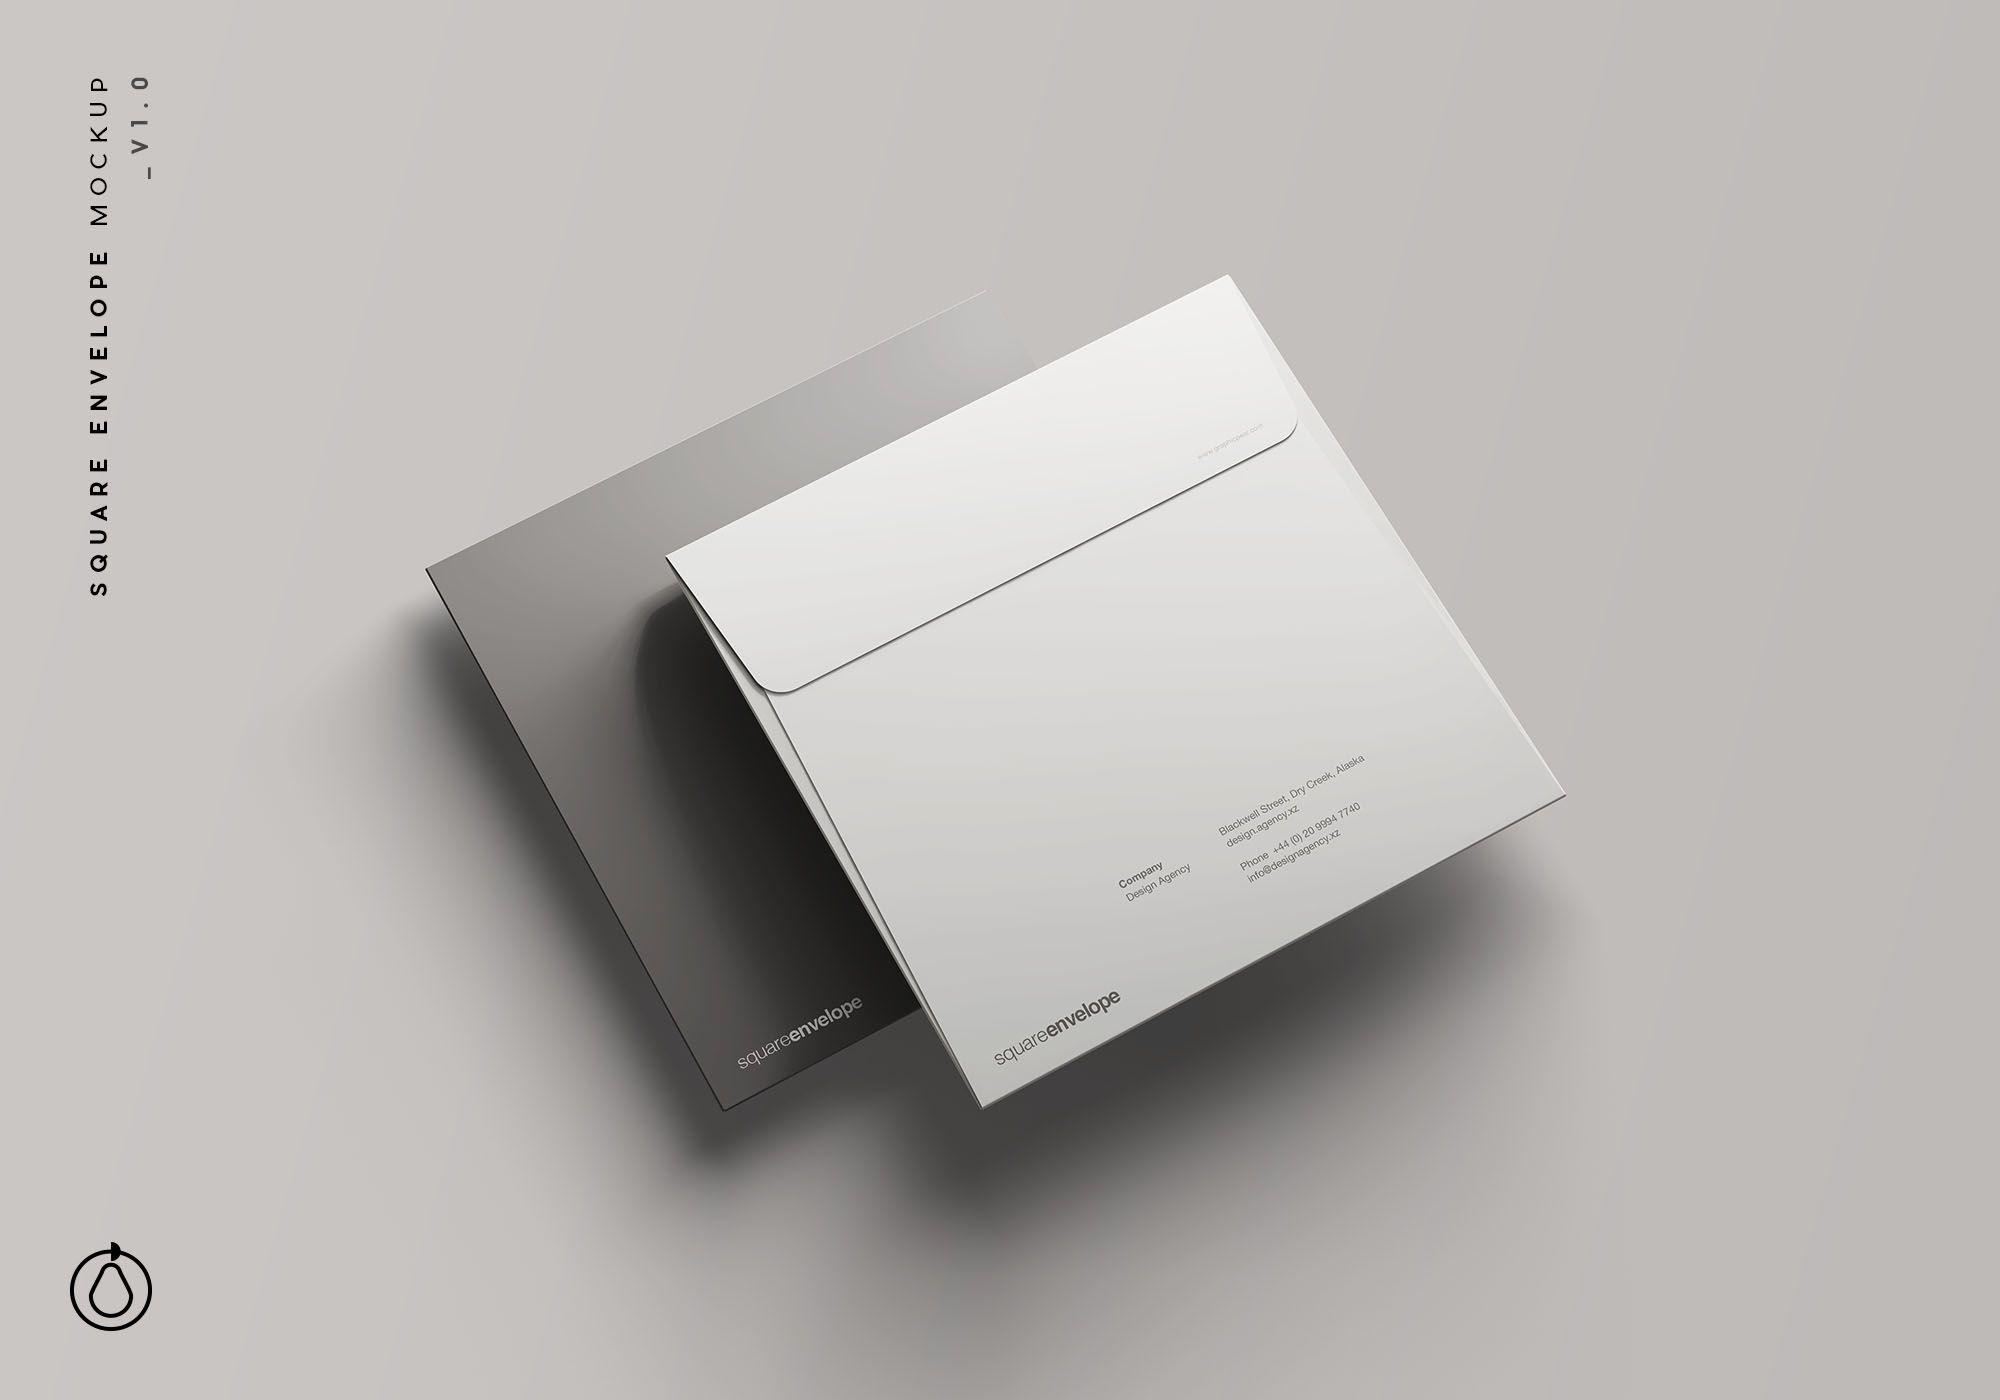 Square Envelope Mockup Square Envelopes Letterpress Christmas Cards Free Stationery